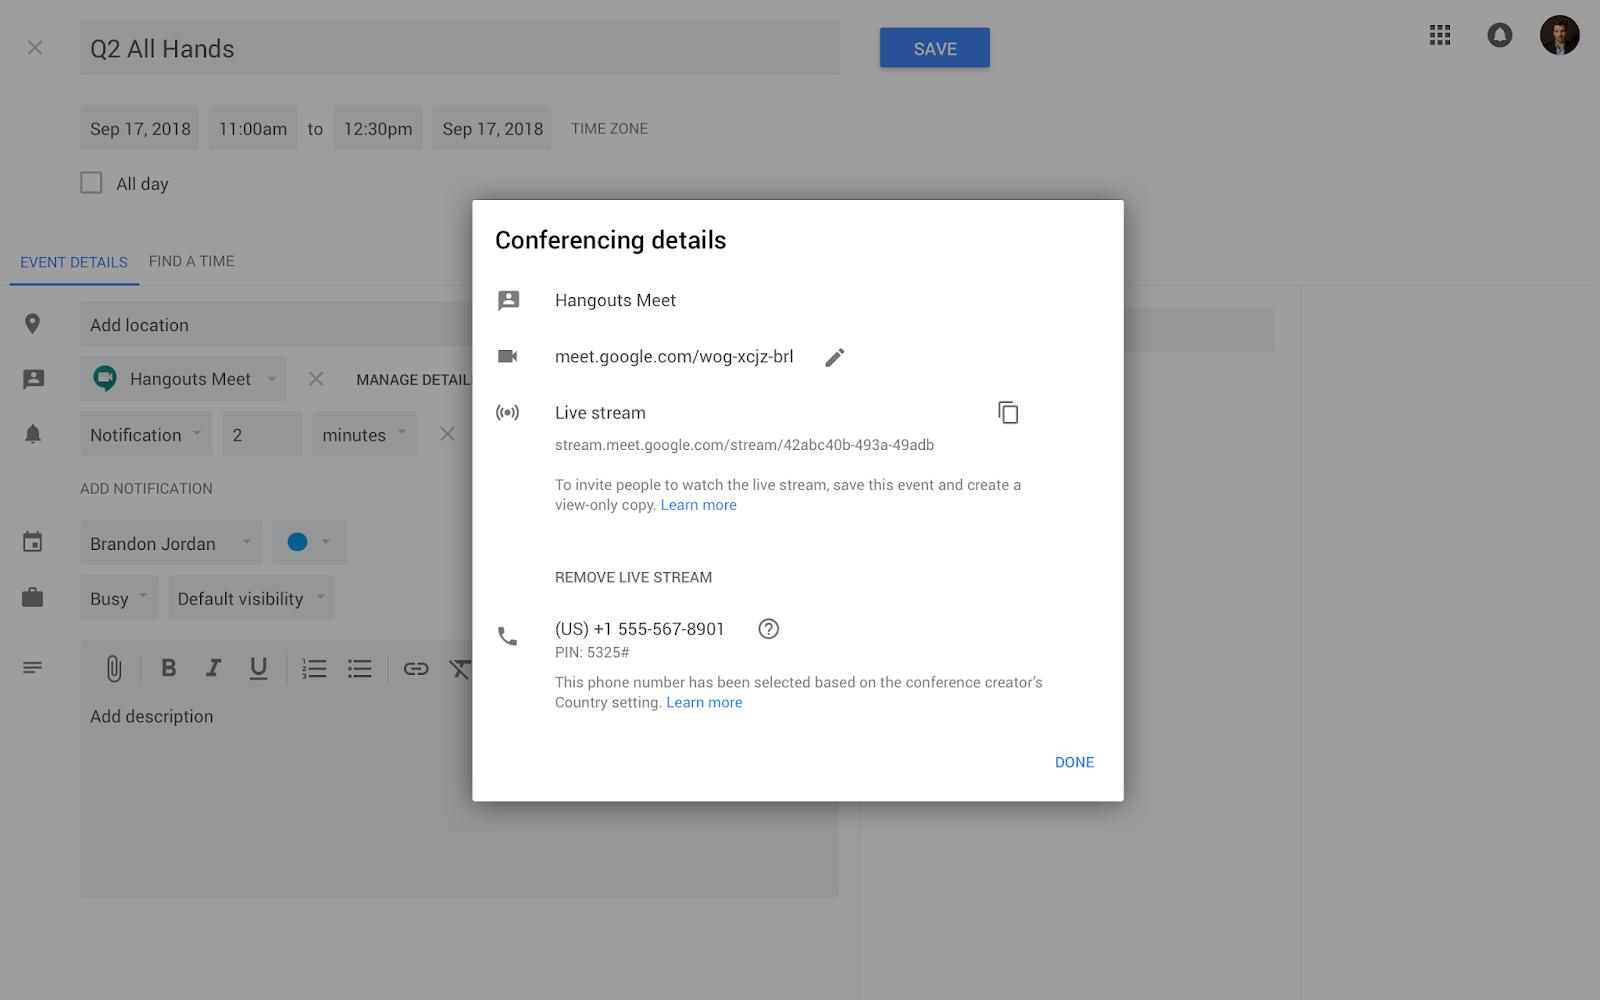 G Suite Updates Blog: Live stream Hangouts Meet meetings